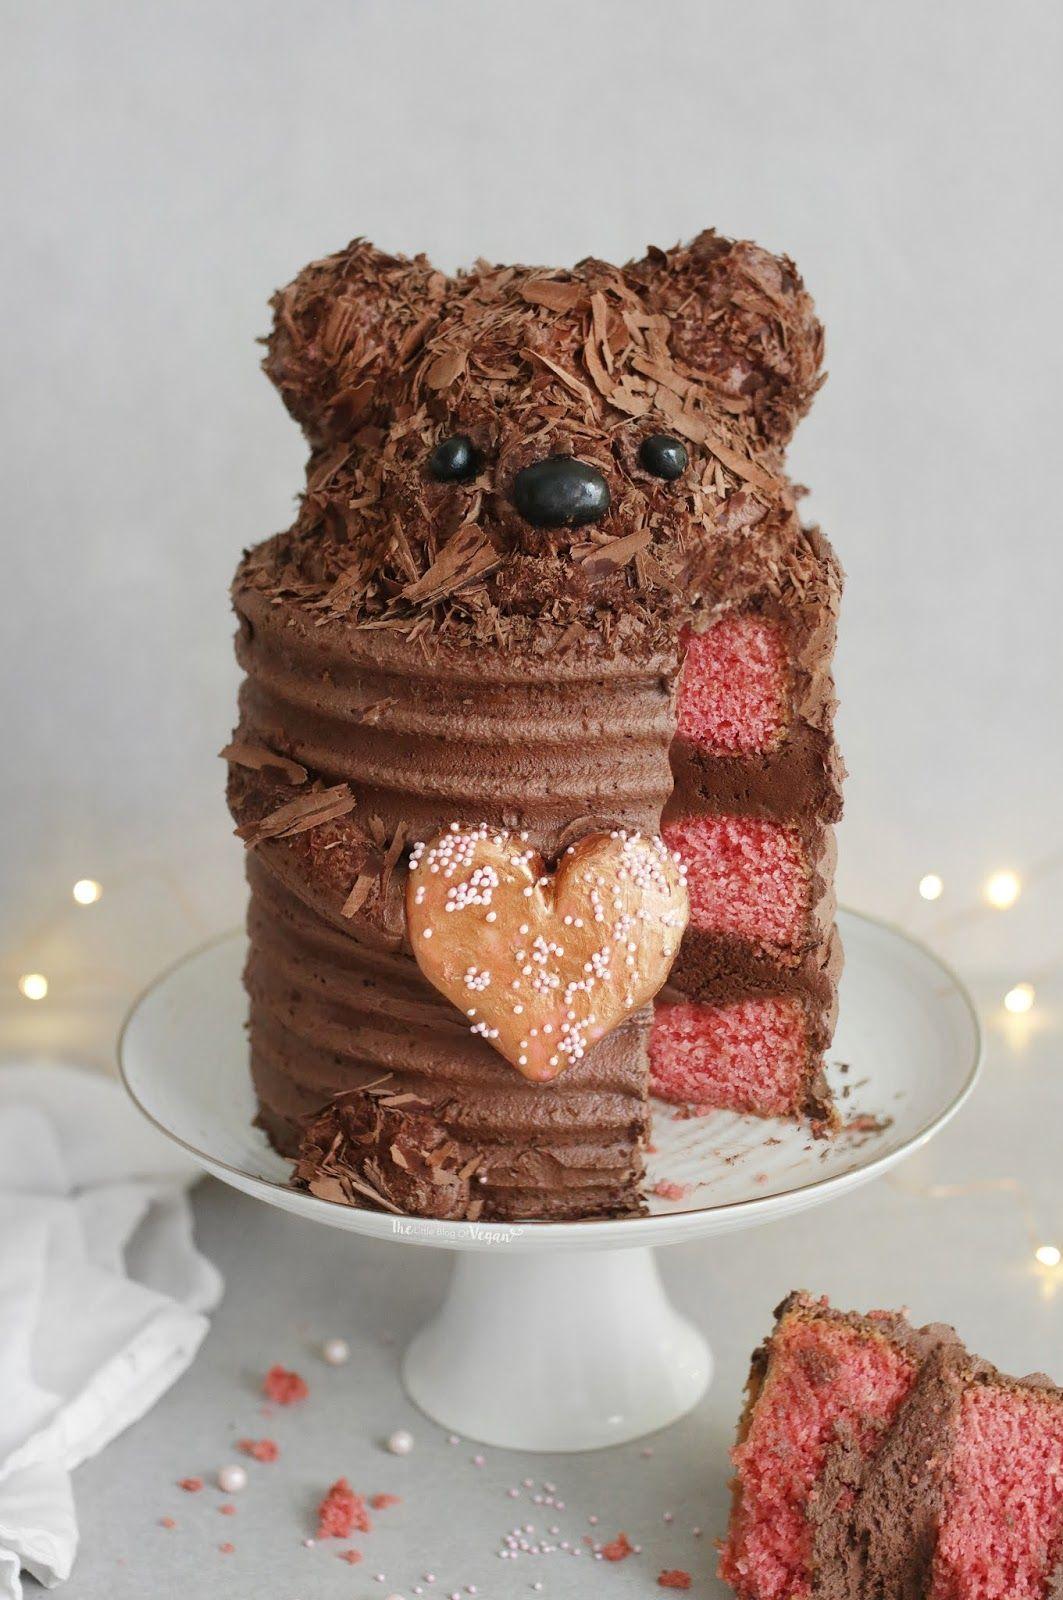 Chocolate bear cake recipe